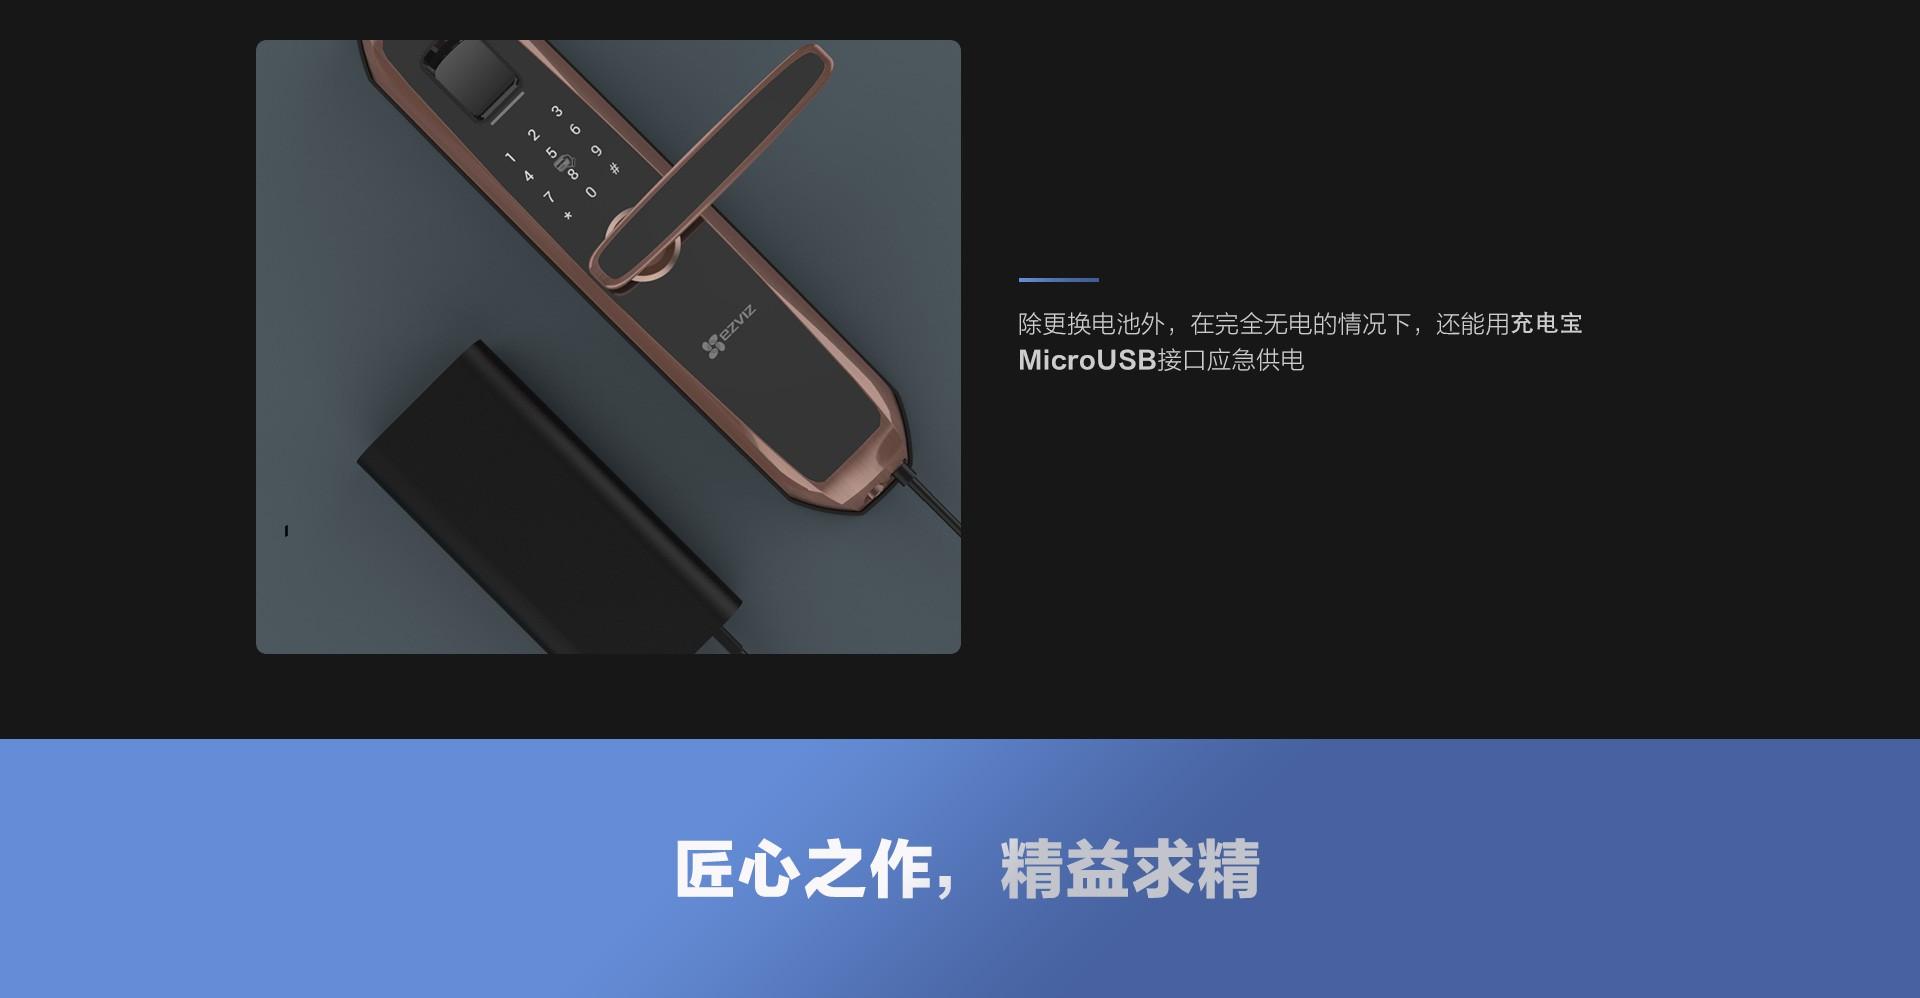 11S-web_19.jpg